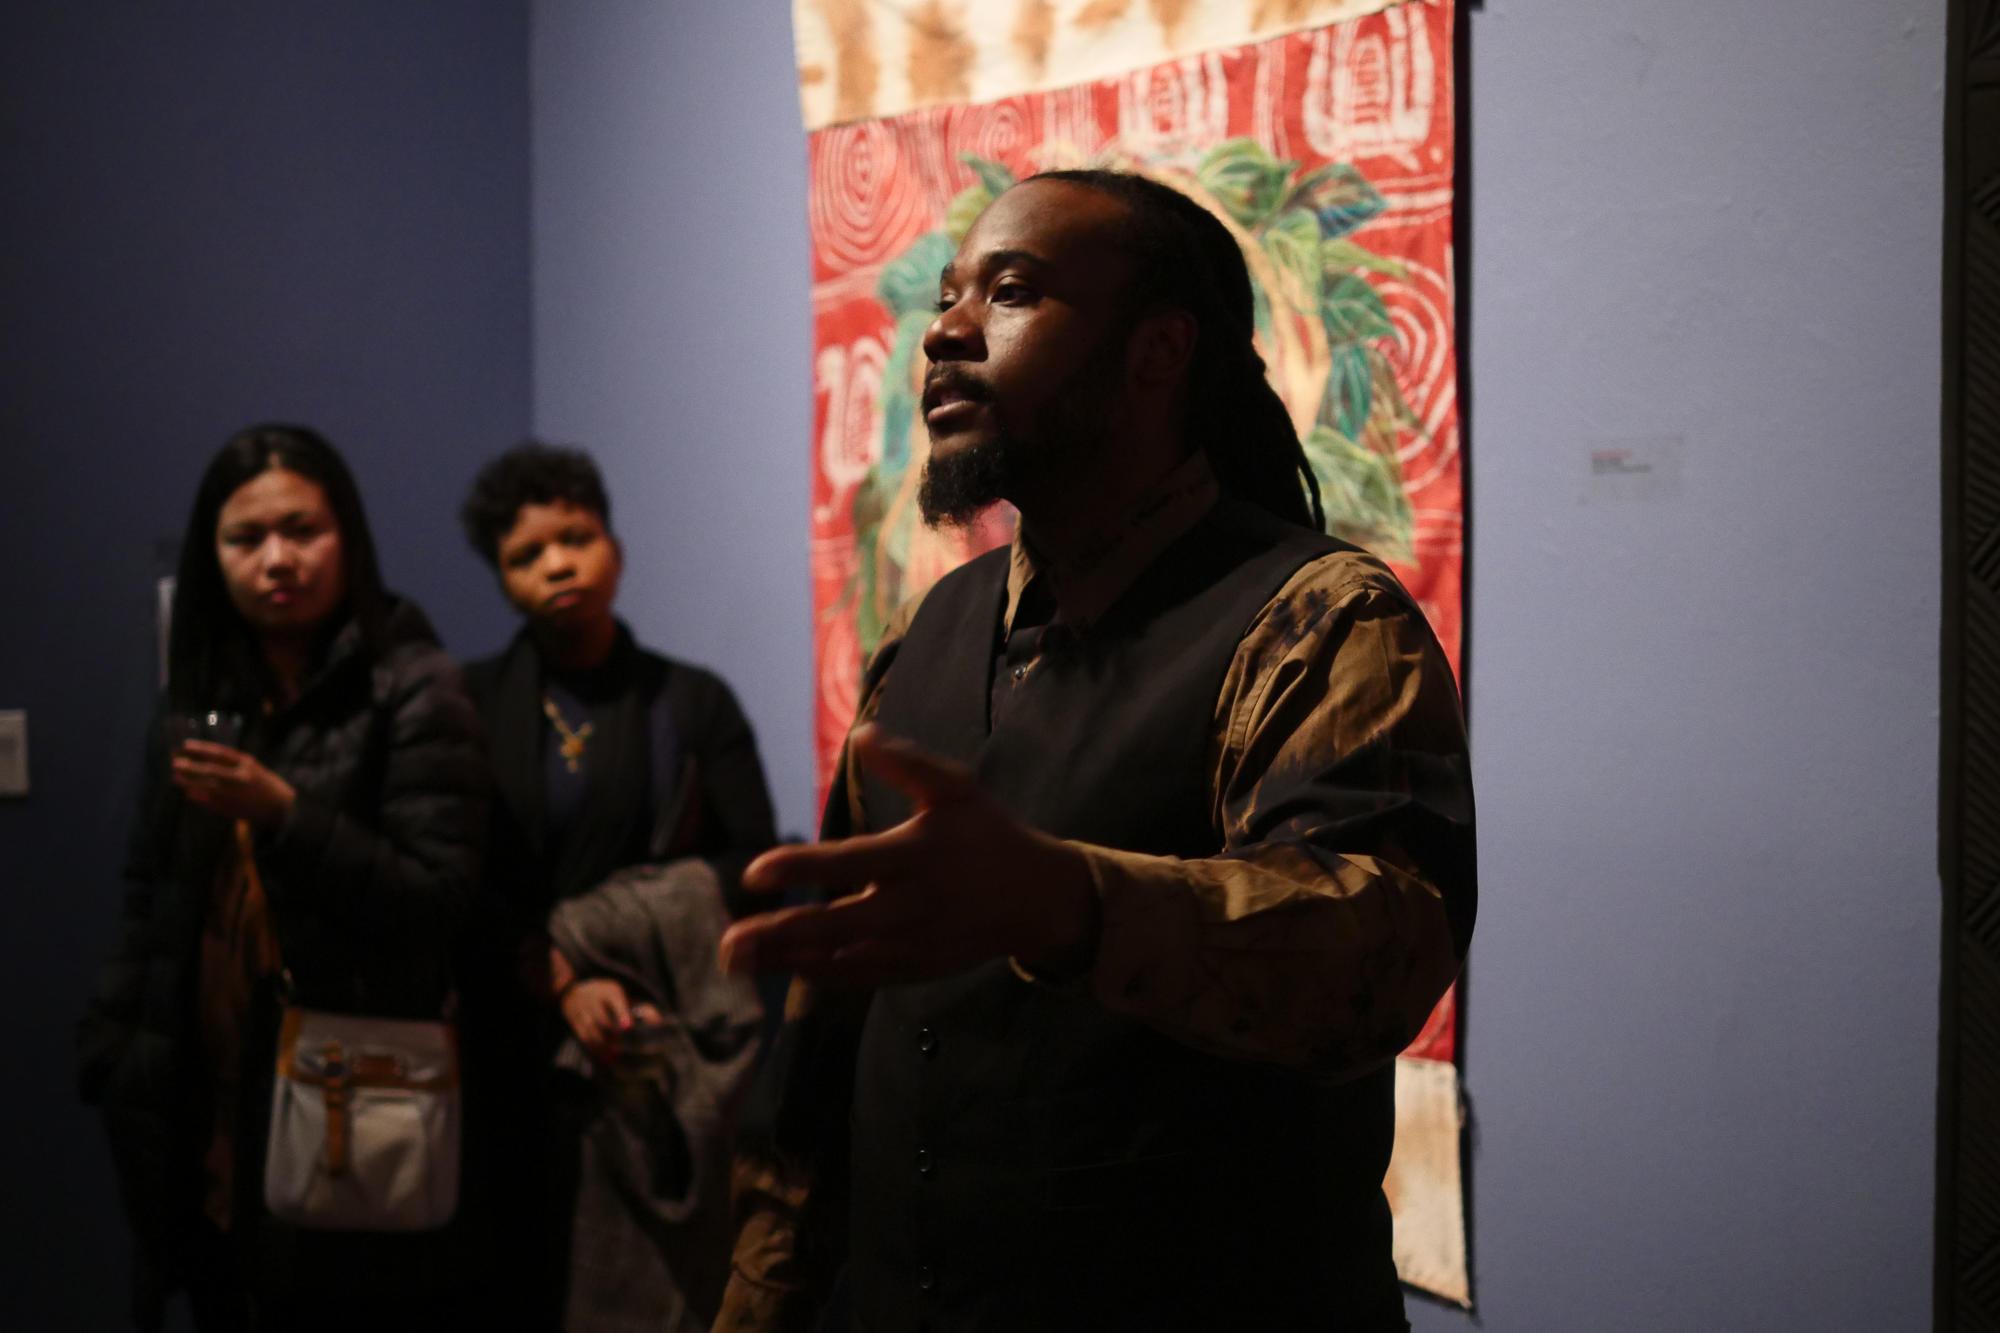 Stephen Hamilton, Visiting Studio Artist. Photo by Chanel Matsunami Govereau.